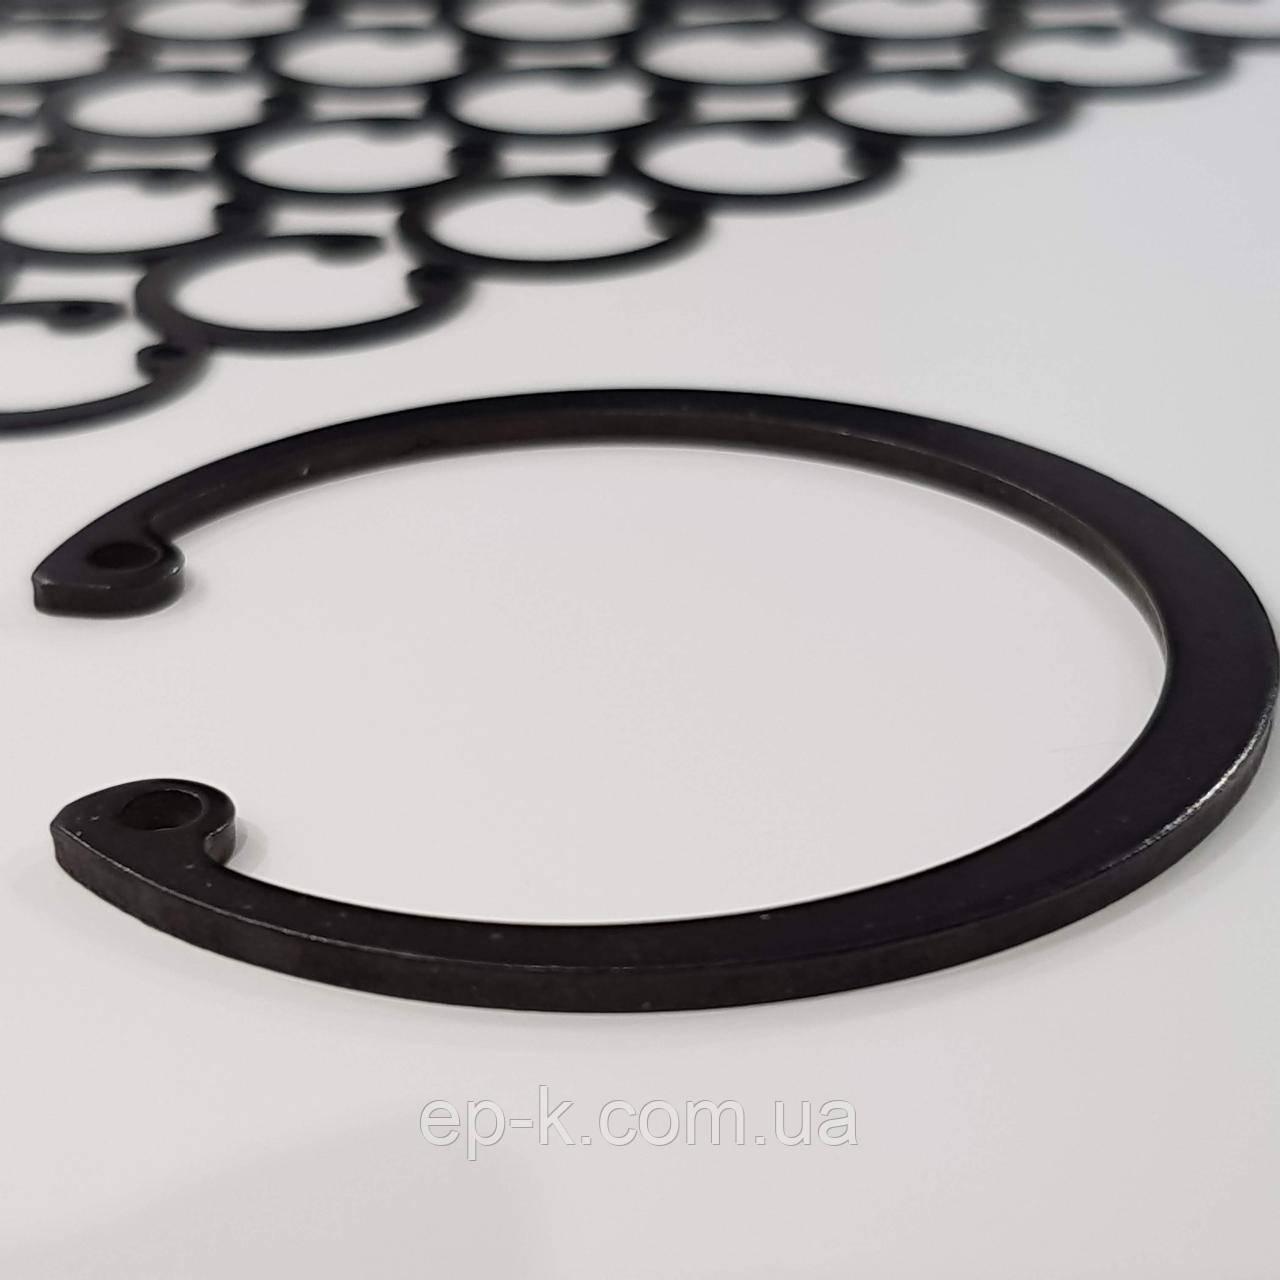 Стопорное кольцо внутреннее А125  ГОСТ 13943-86, DIN 472